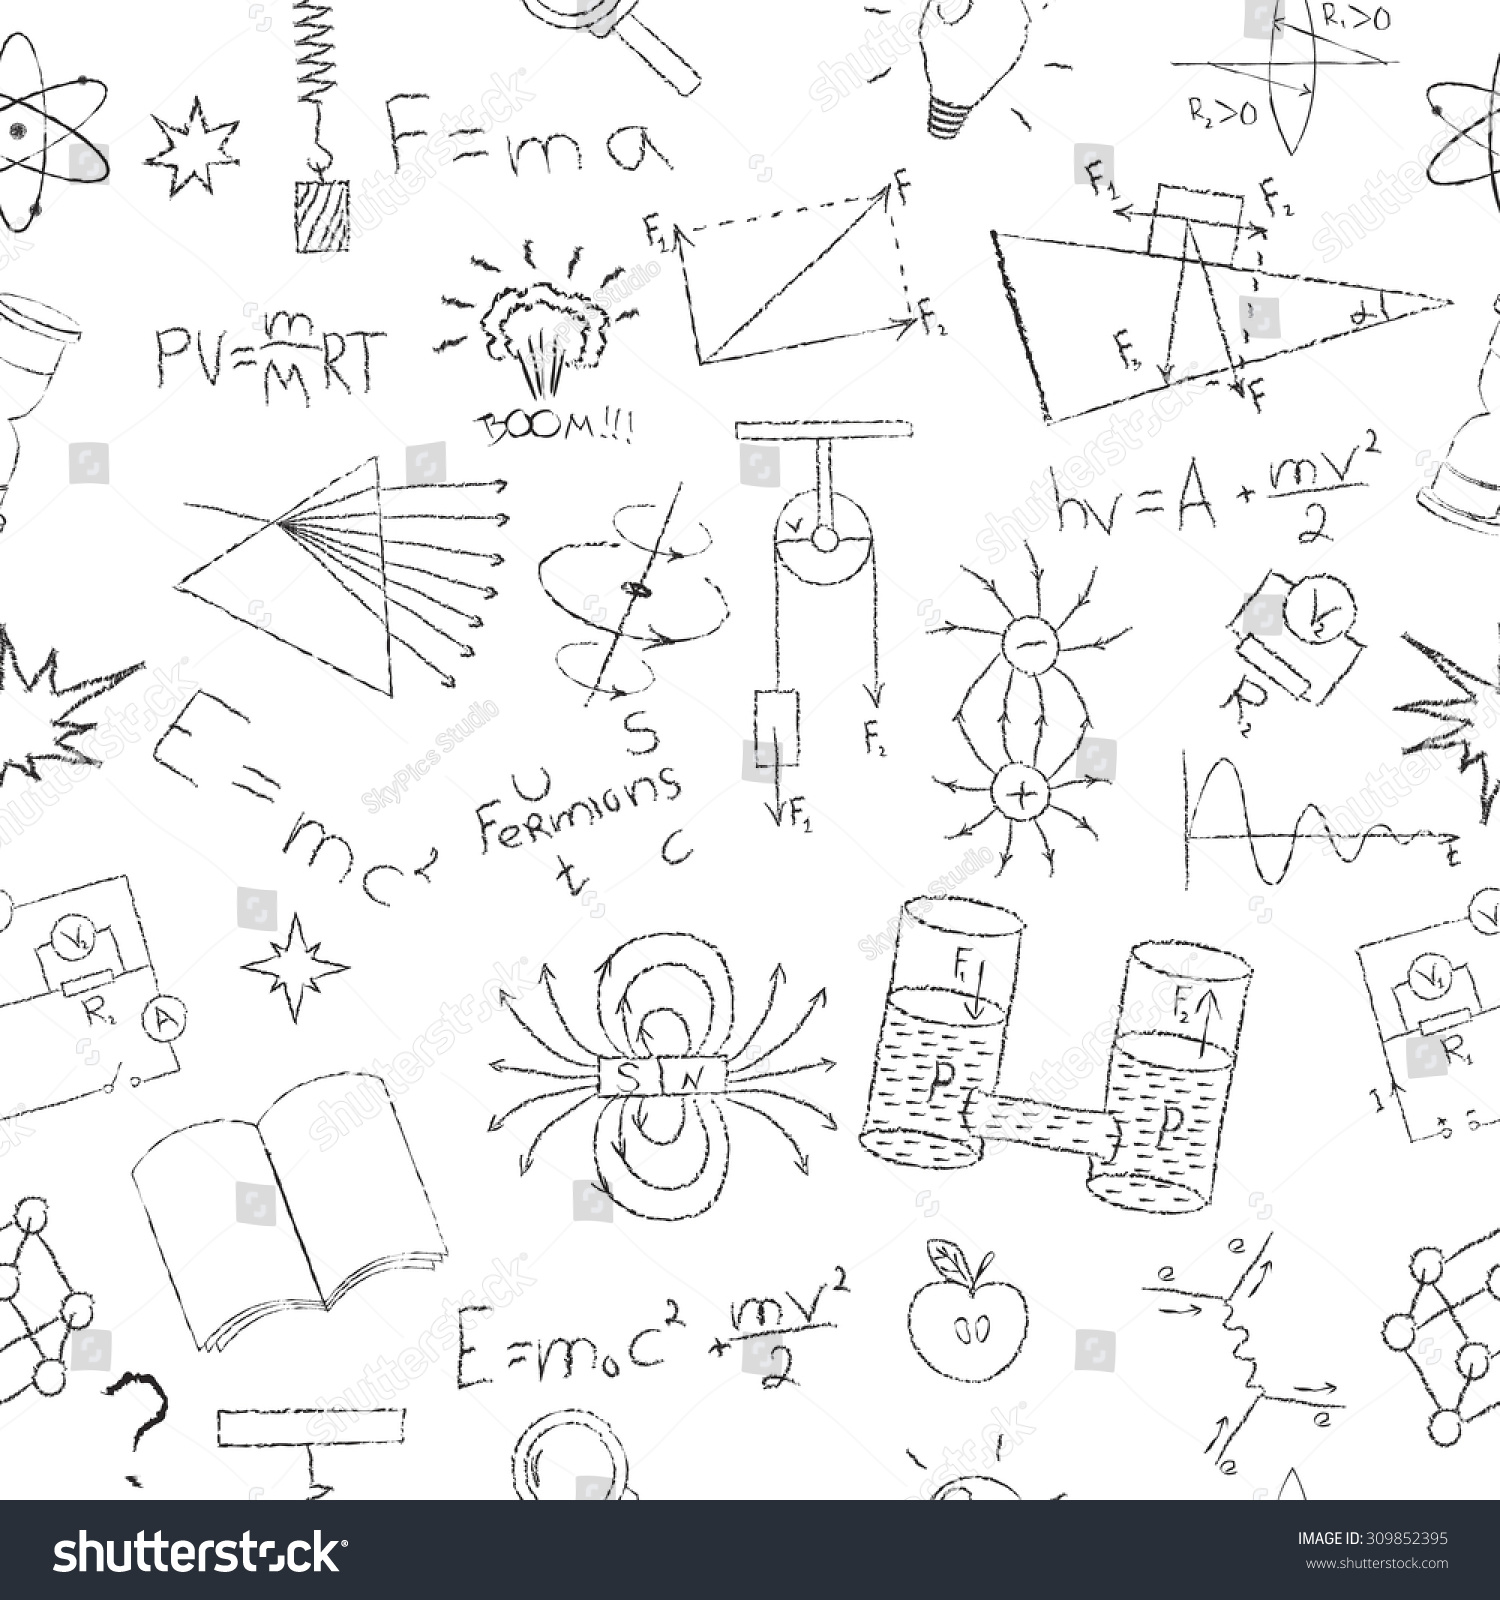 physics background stock photos - photo #14